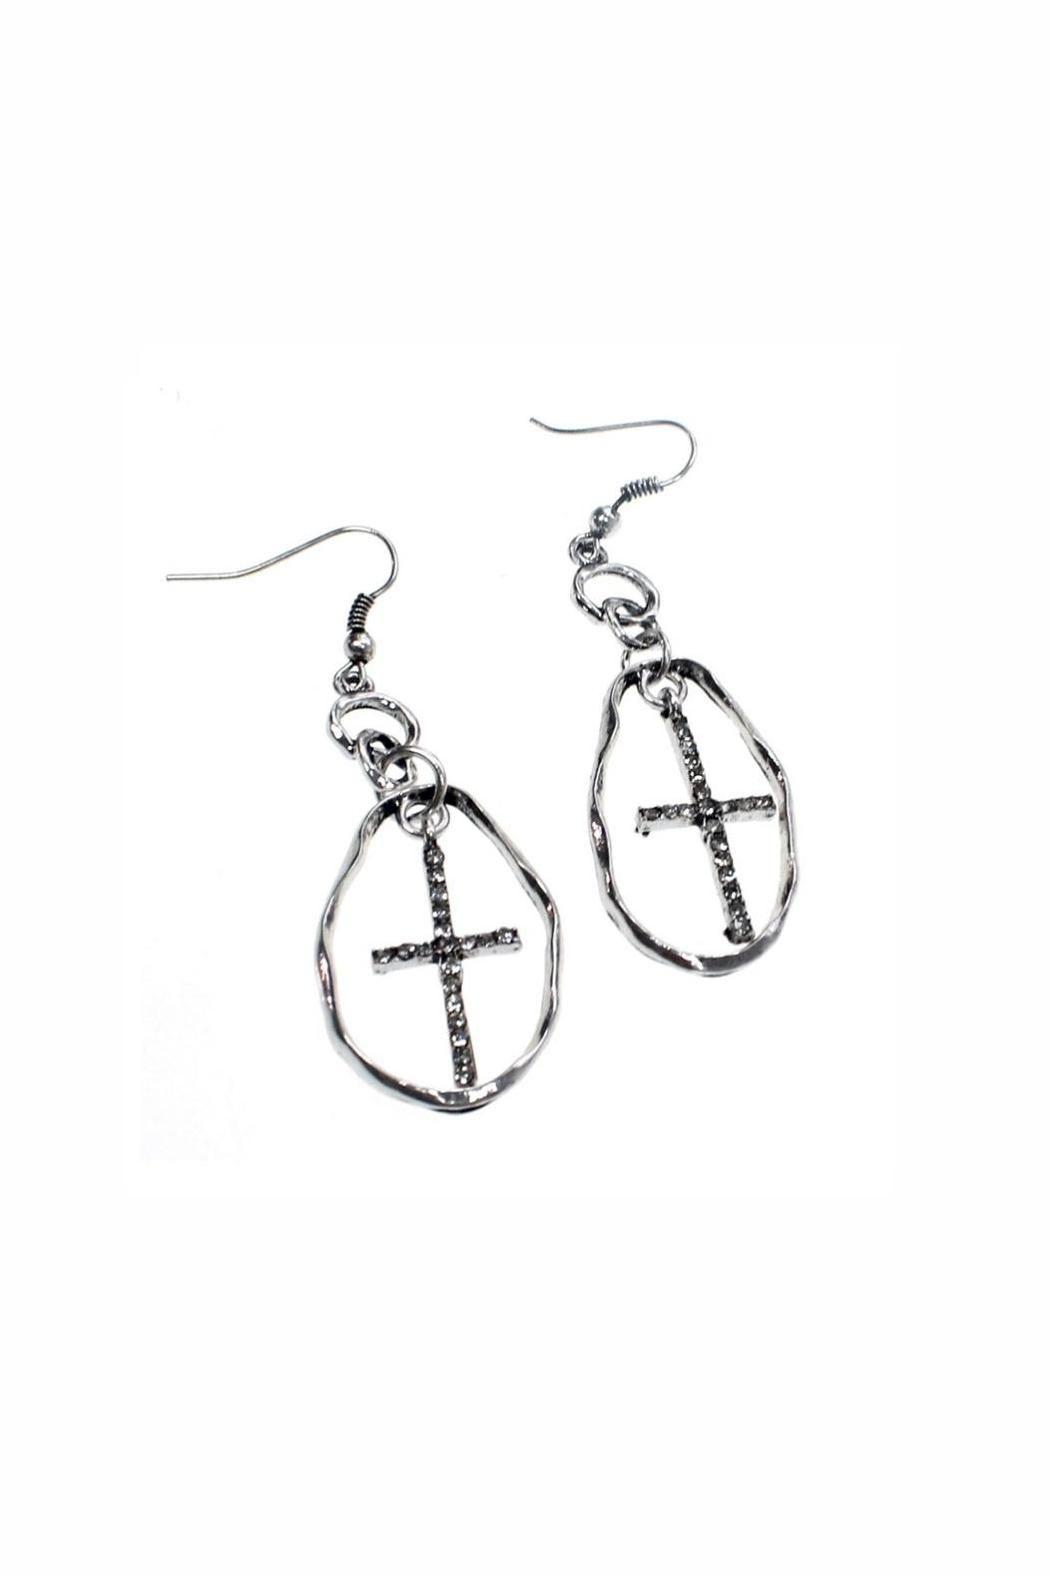 Oval Hoop with Cross Earrings. Adds Bling to just about anything.   Hoop Cross Earrings by Sweet Lola. Accessories - Jewelry - Earrings California